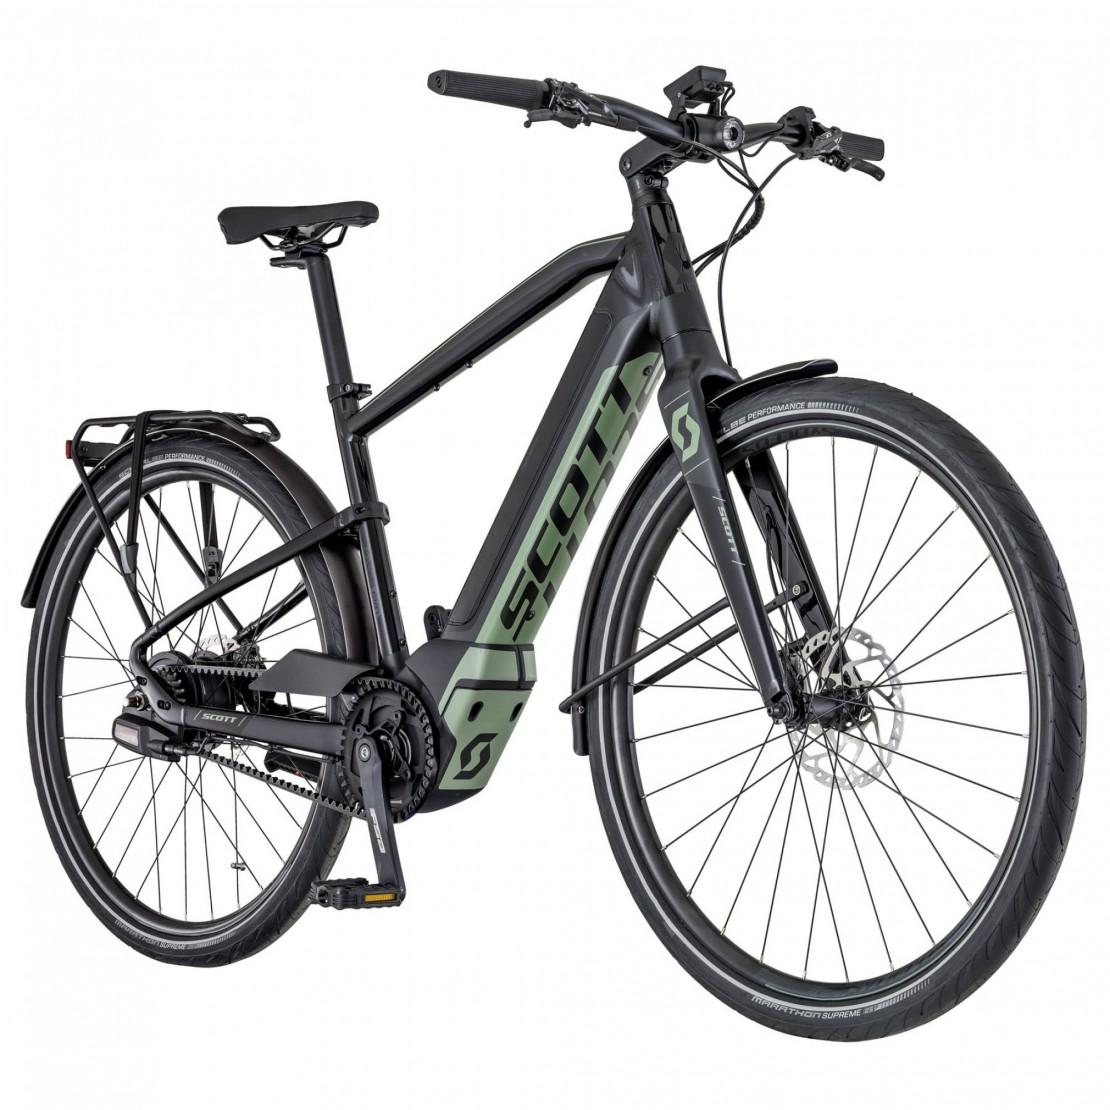 Scott E-Silence Evo, 2018 electric bike